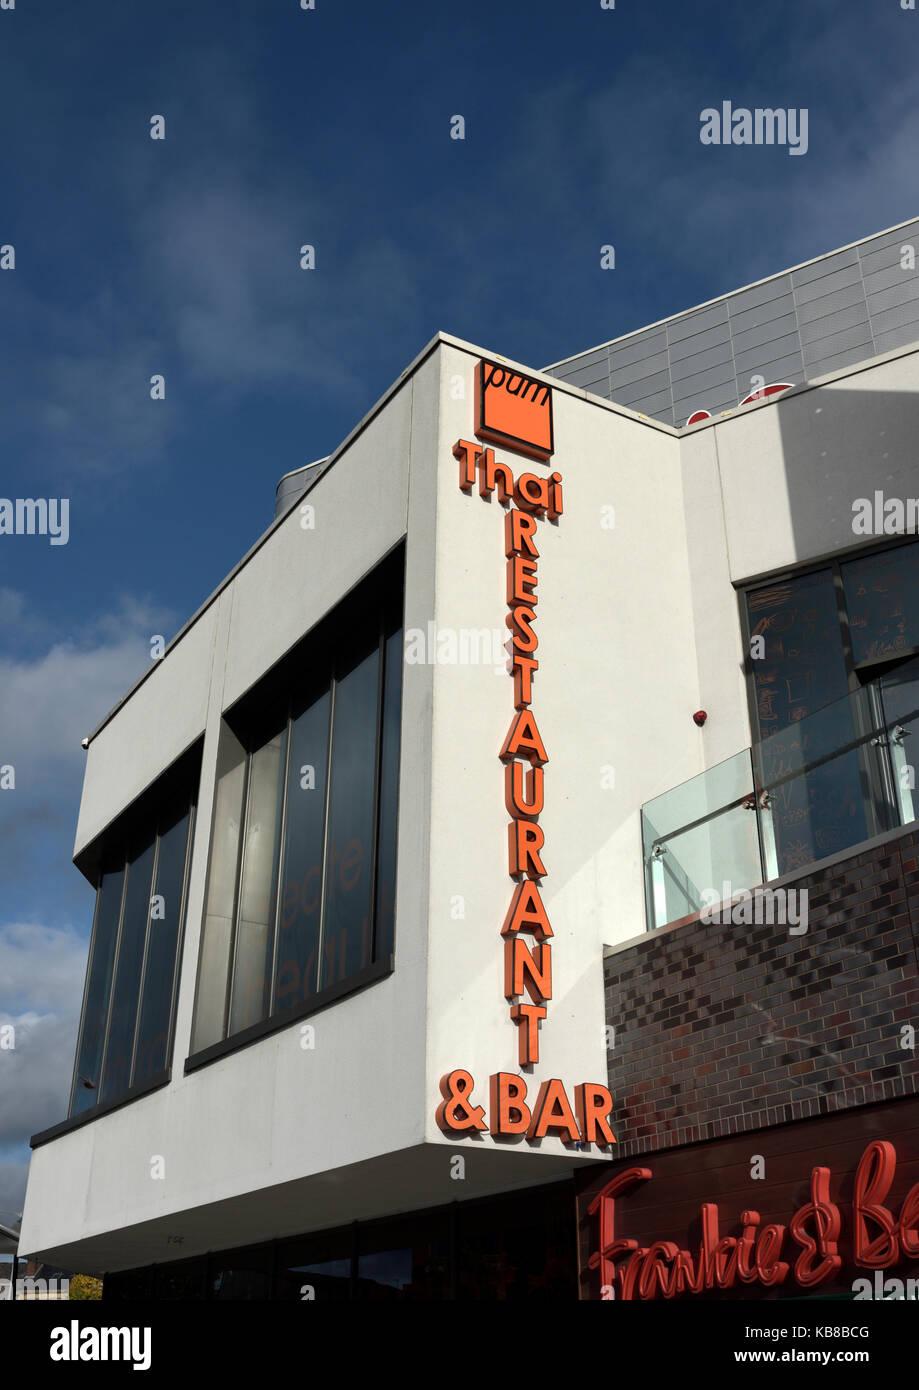 Thai restaurant and bar on the rock in bury lancashire uk - Stock Image